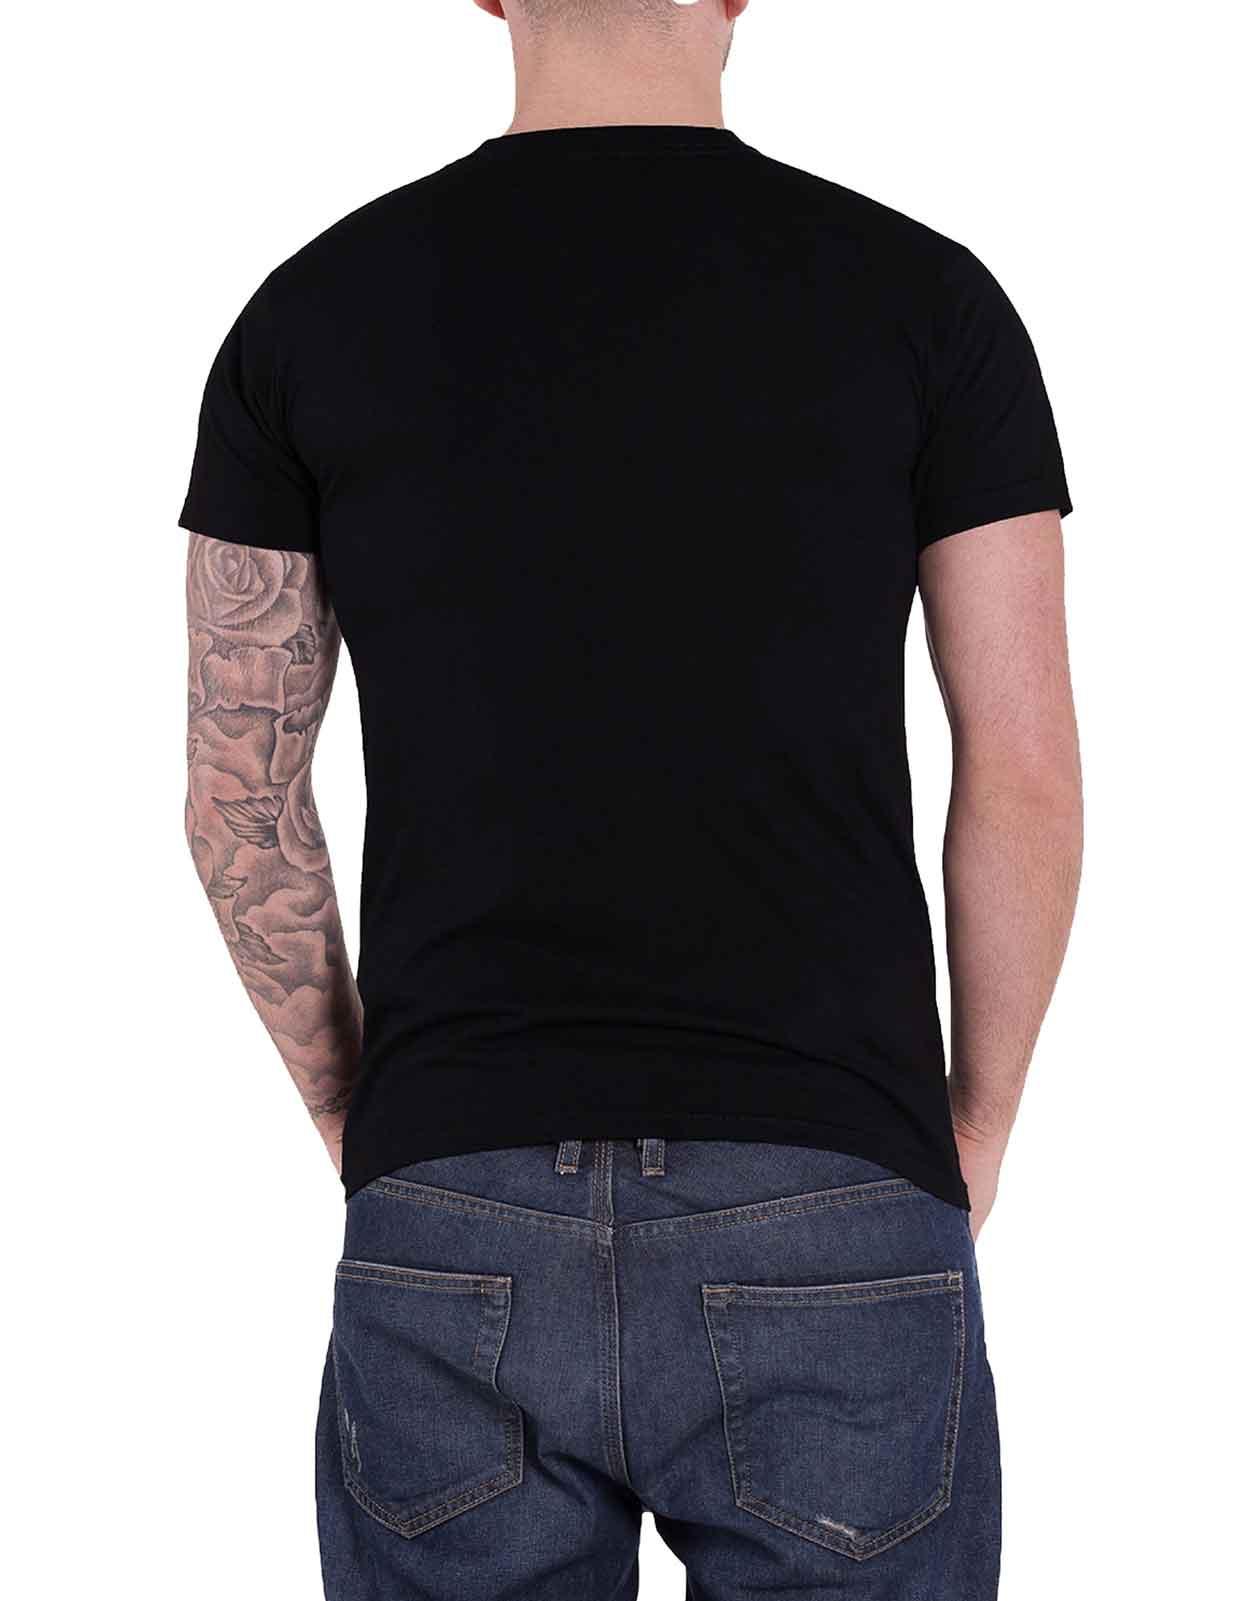 Official-Motley-Crue-T-Shirt-Shout-at-the-Devil-The-Dirt-Tour-Band-Logo-Mens thumbnail 19